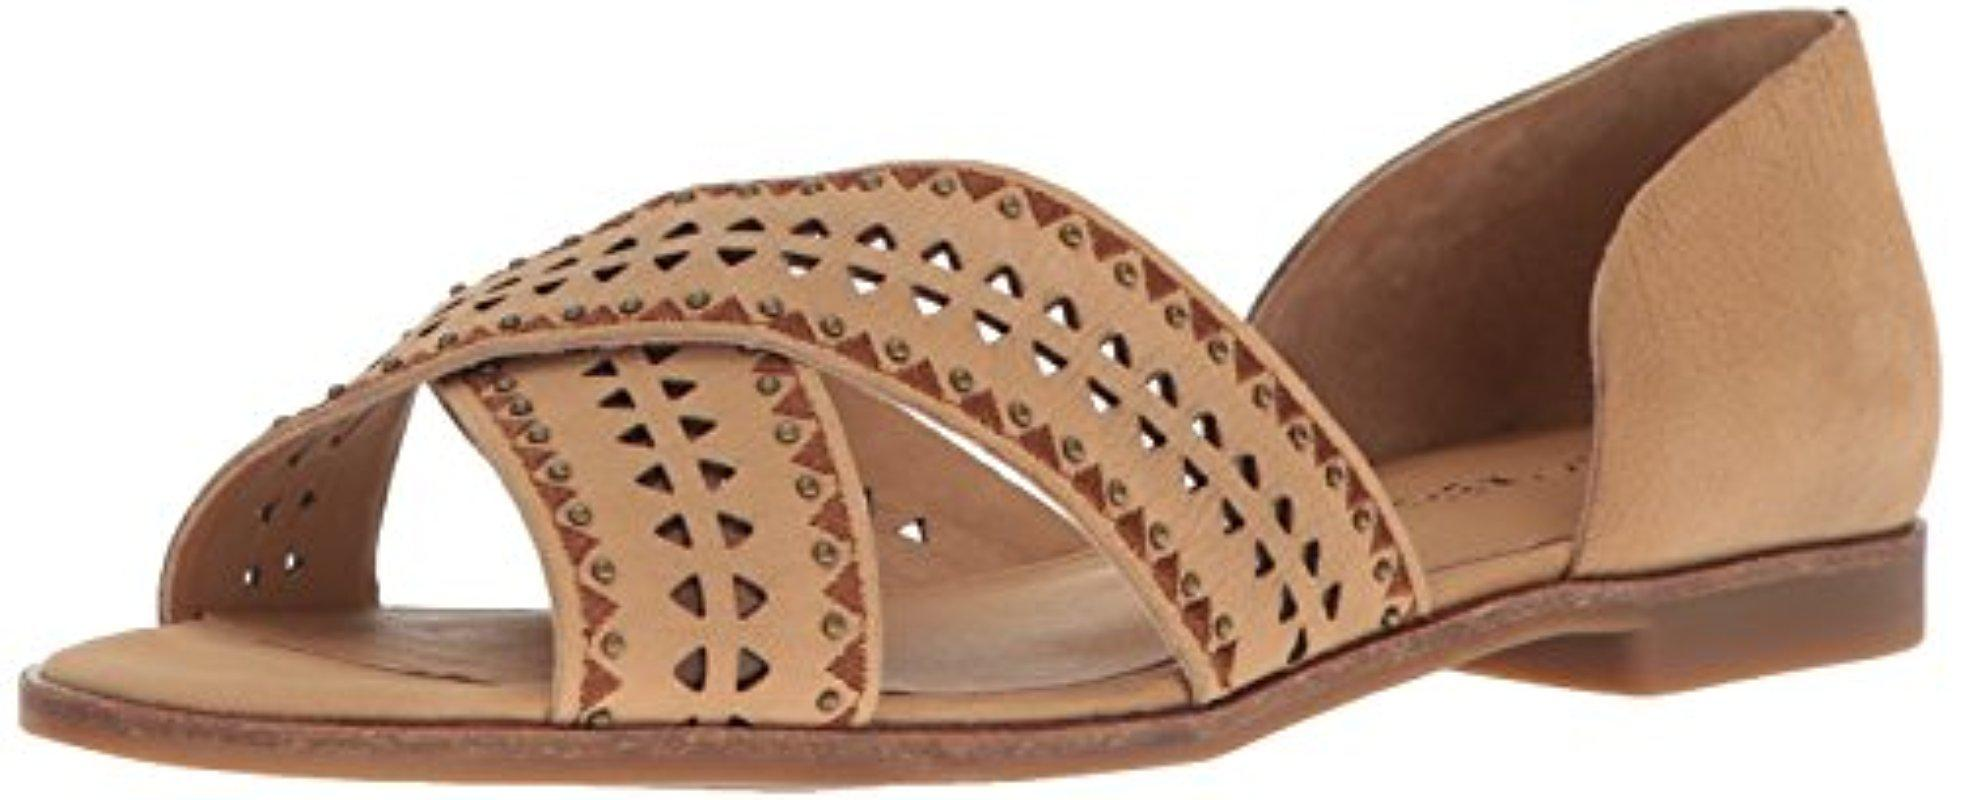 Lucky Brand. Women's Brown Lk-gallah2 Sandal